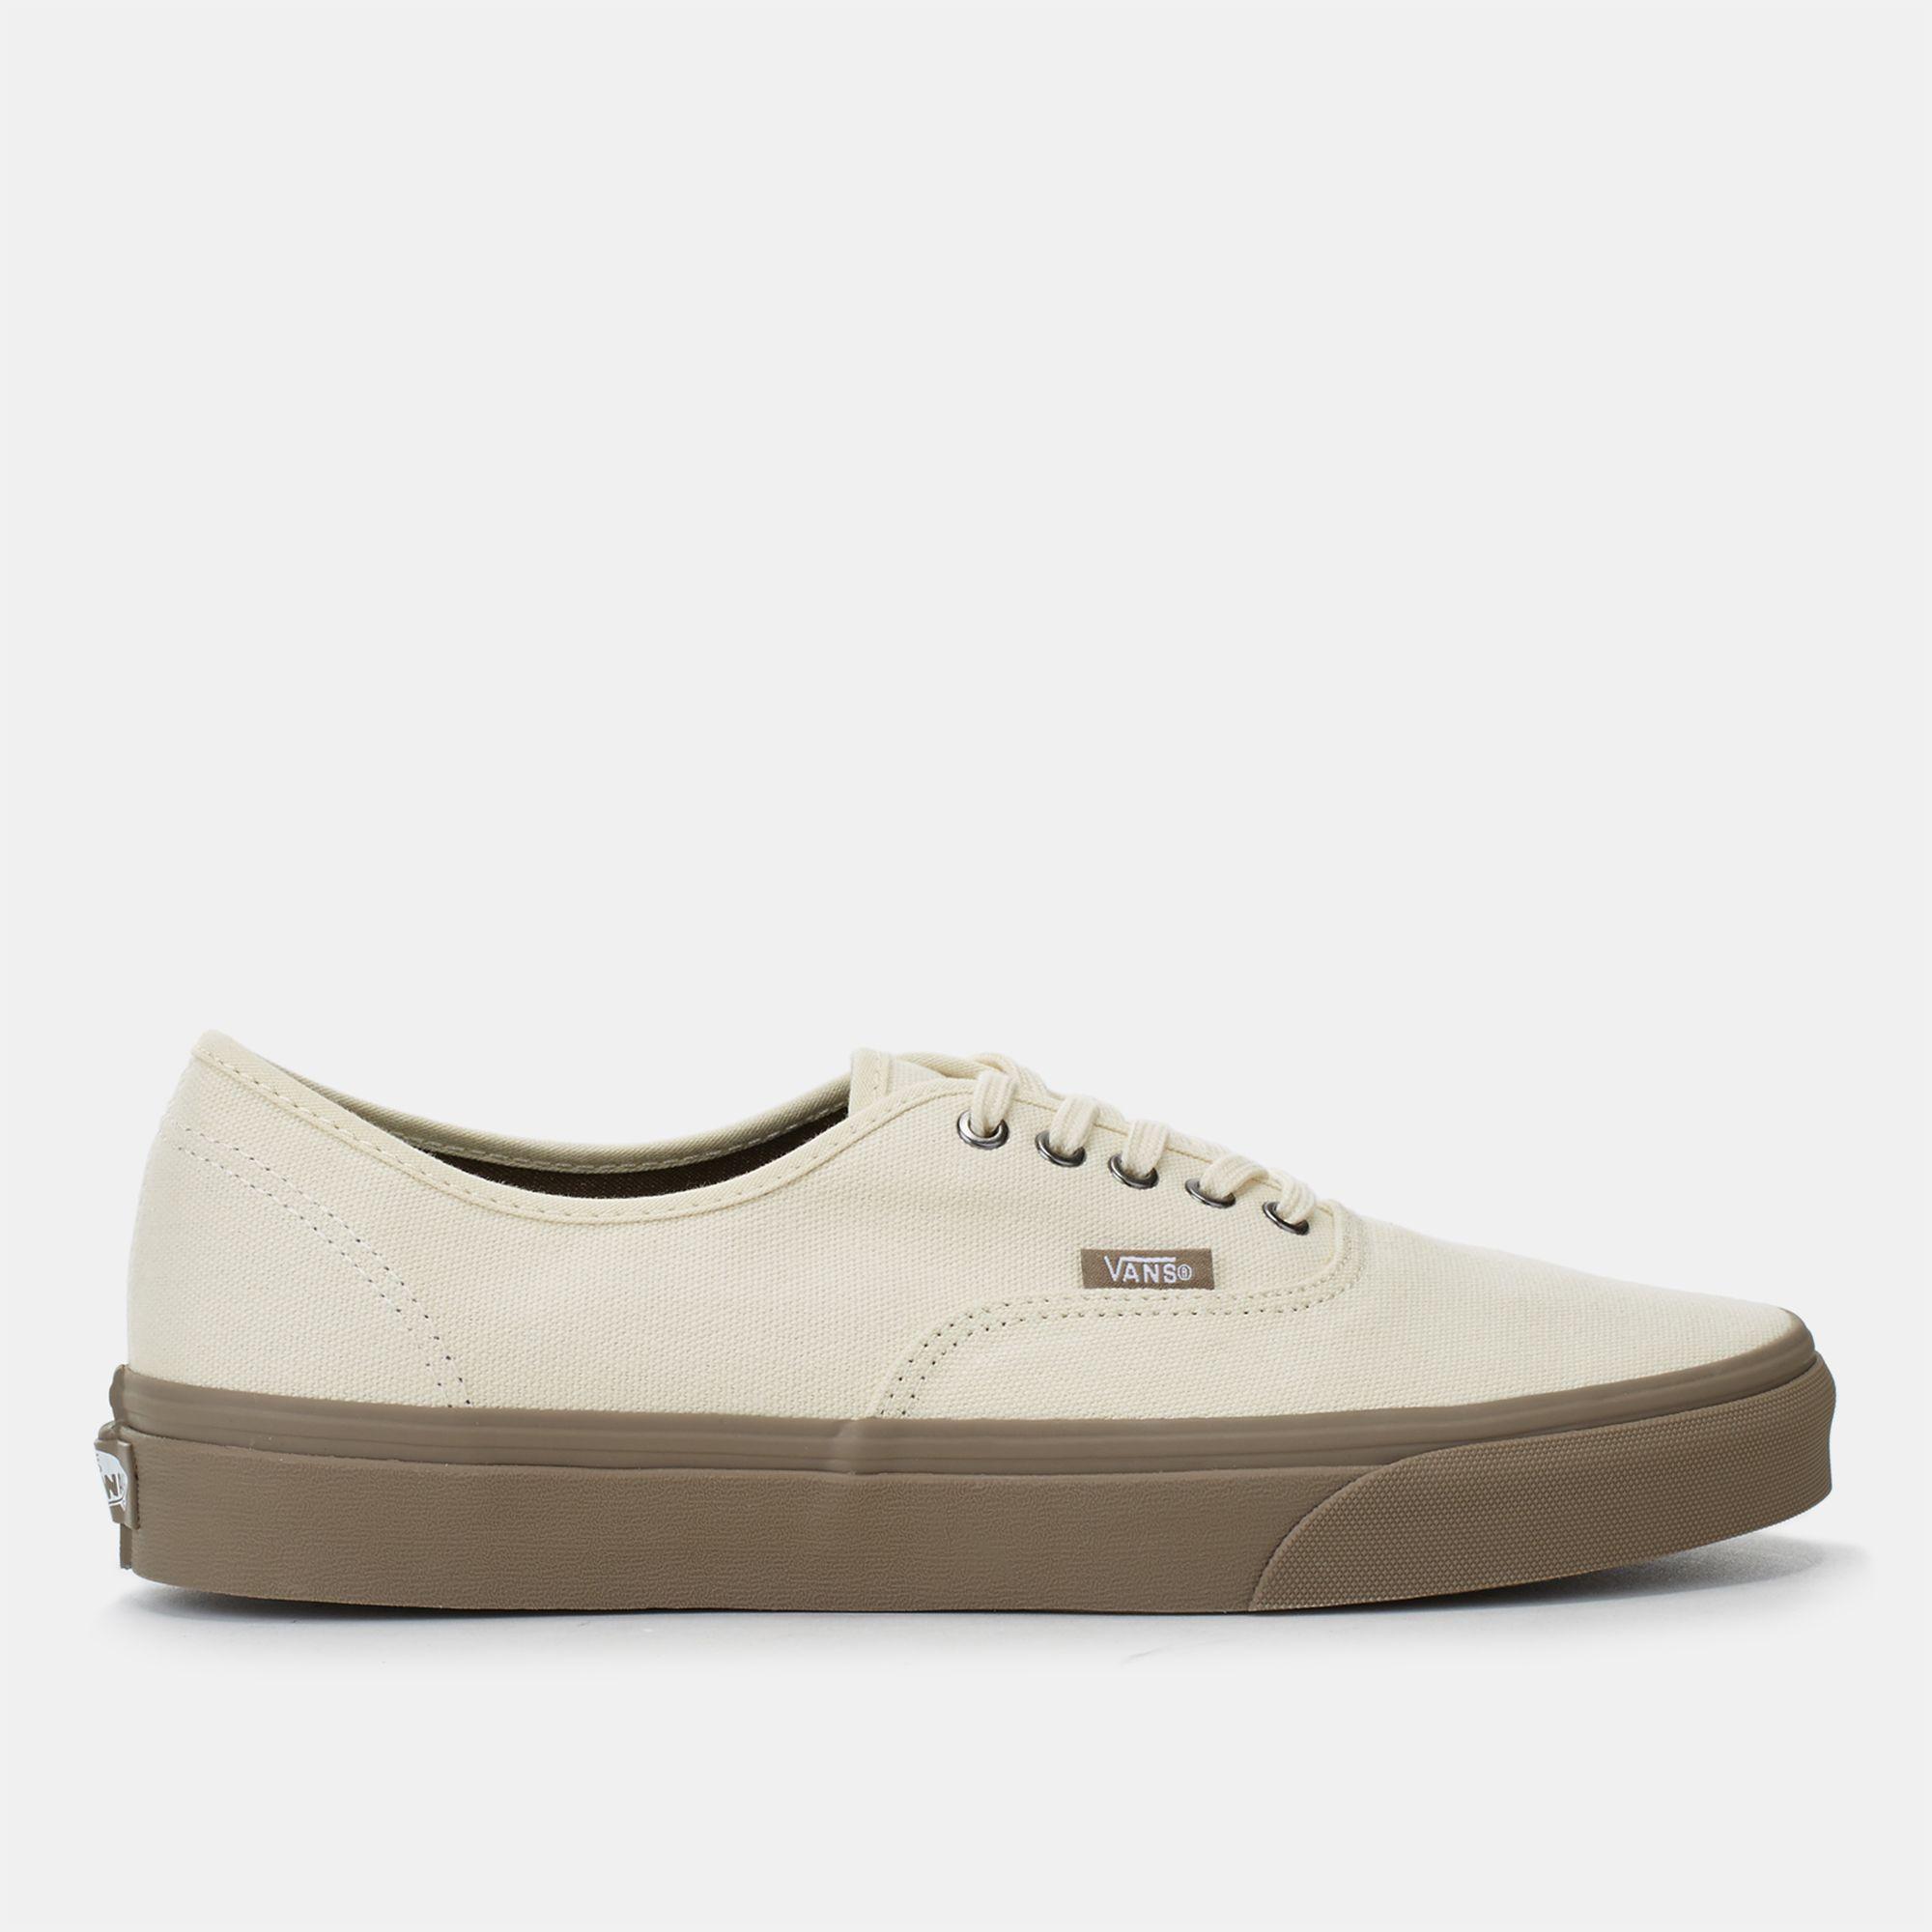 242c36a3f حذاء سي اند دي أوثنتك من فانس | احذية سنيكرز للرجال | تخفيضات ...